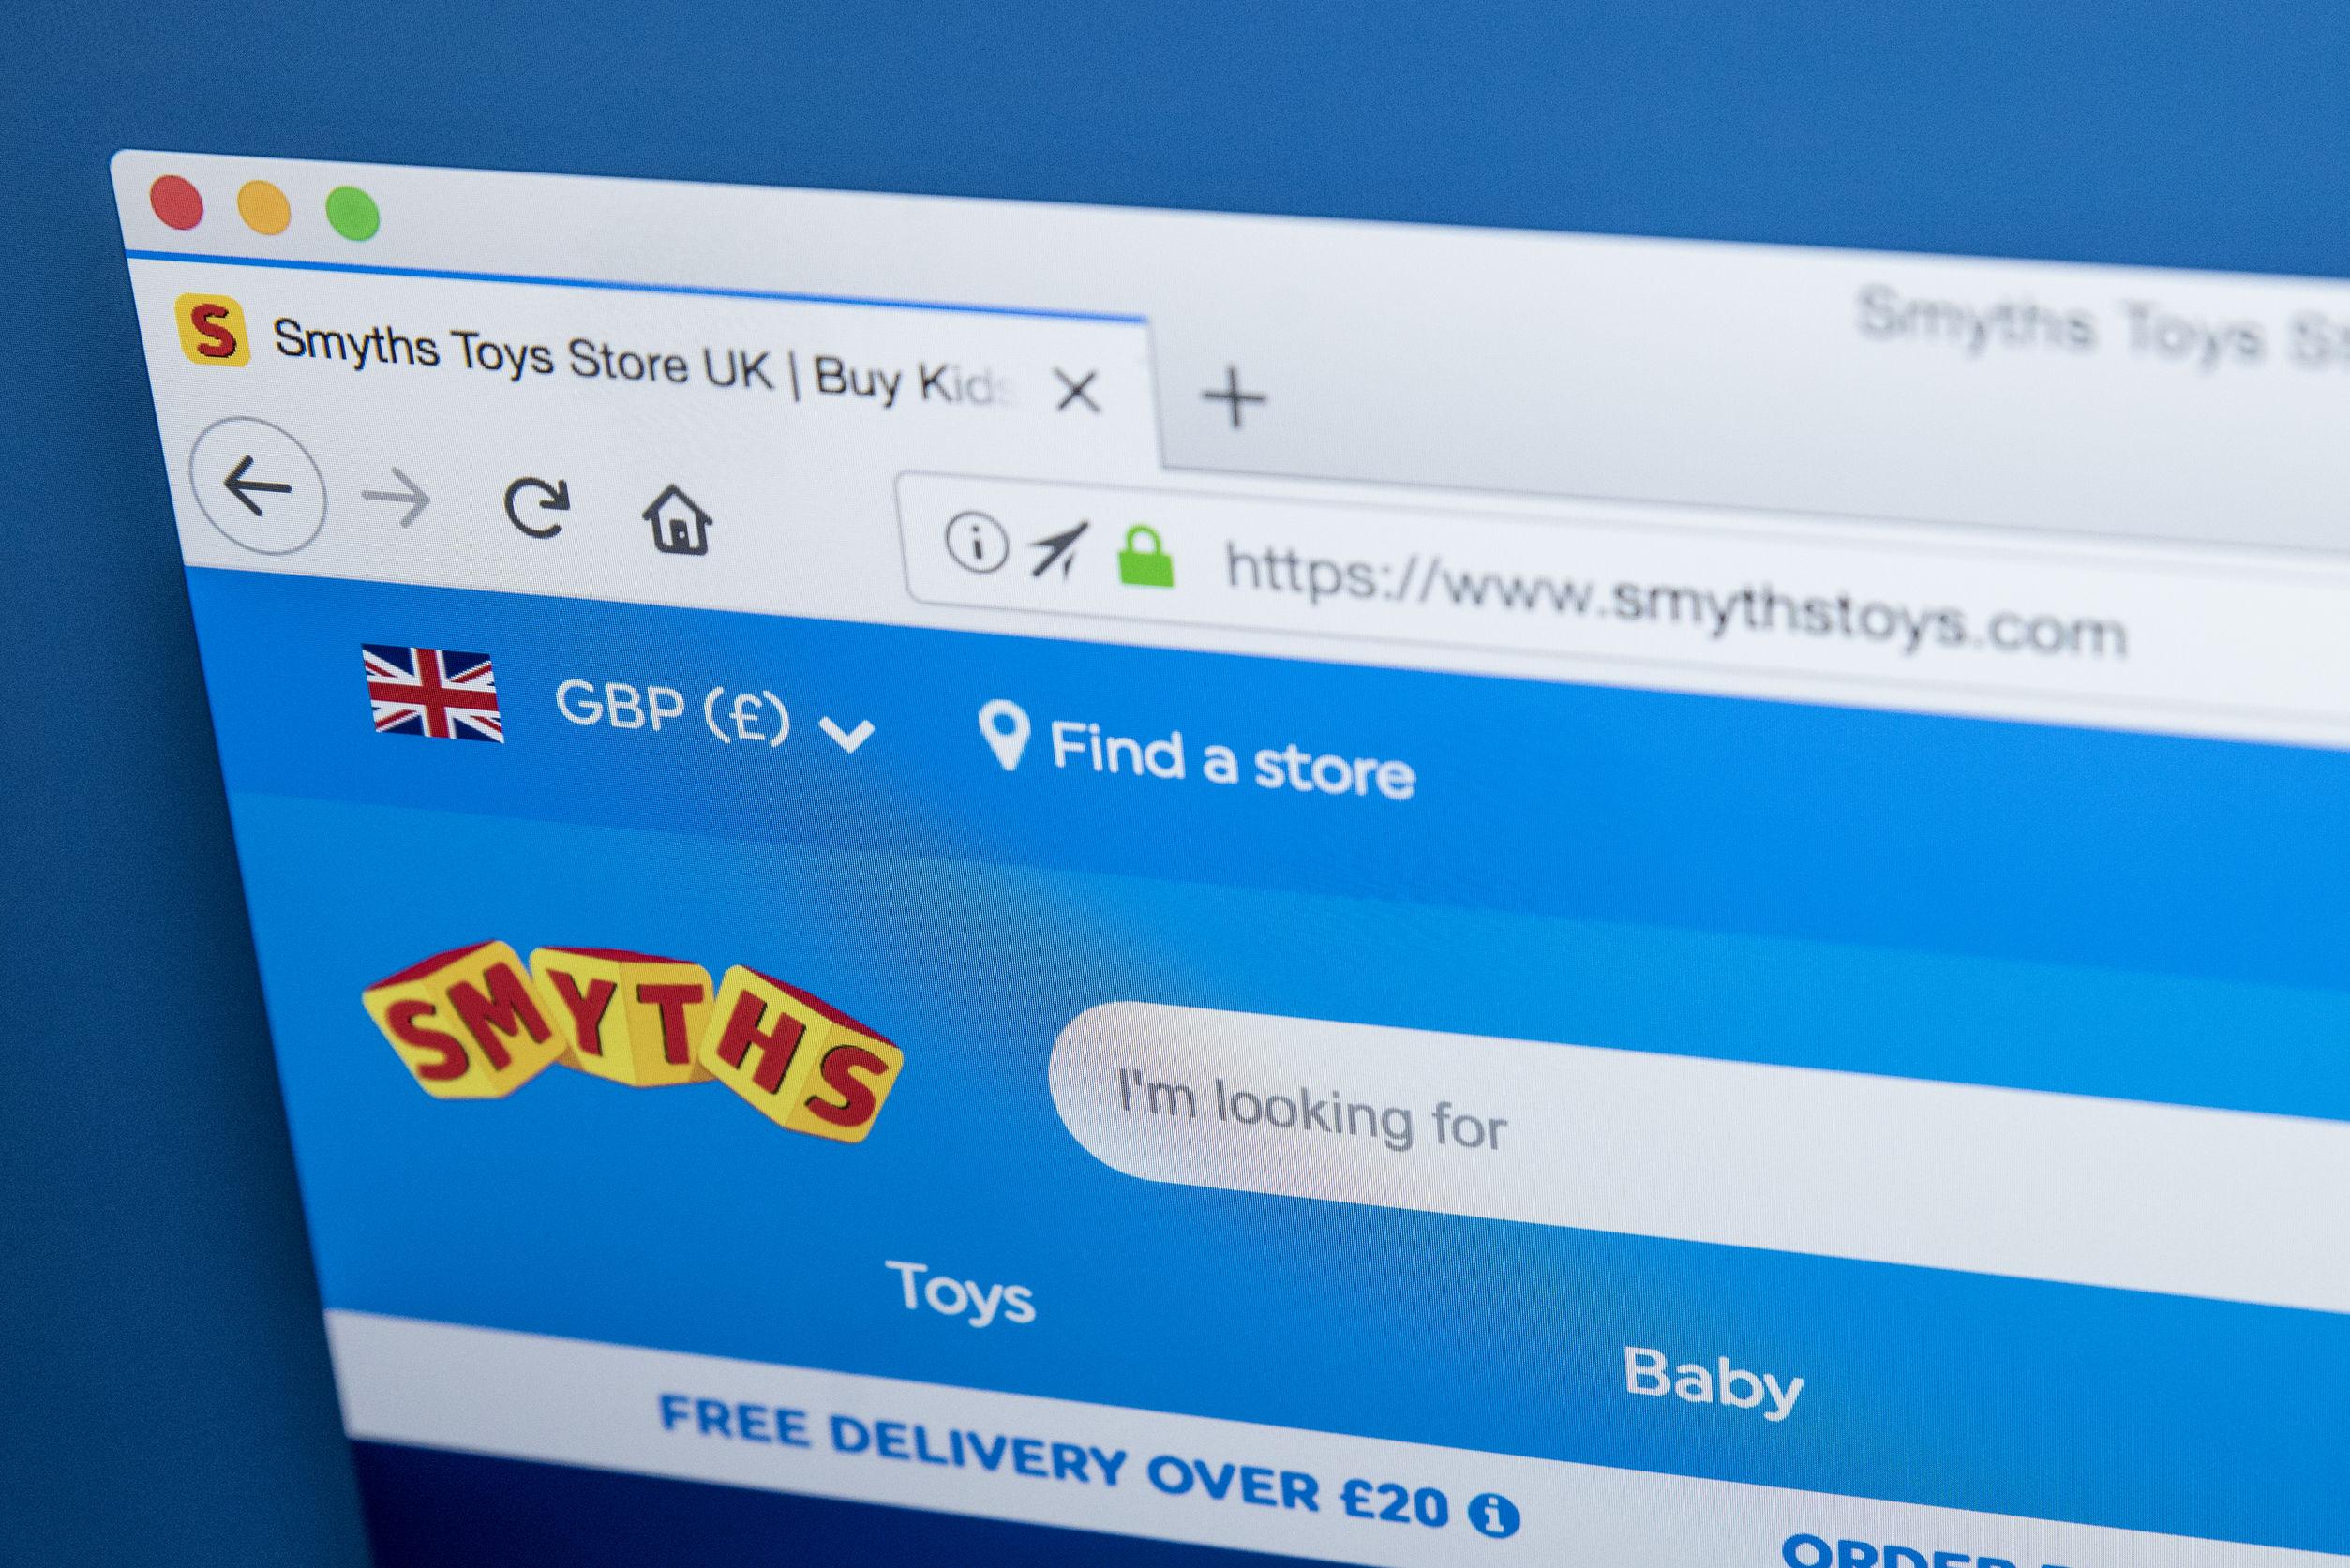 smyths toys nhs discount